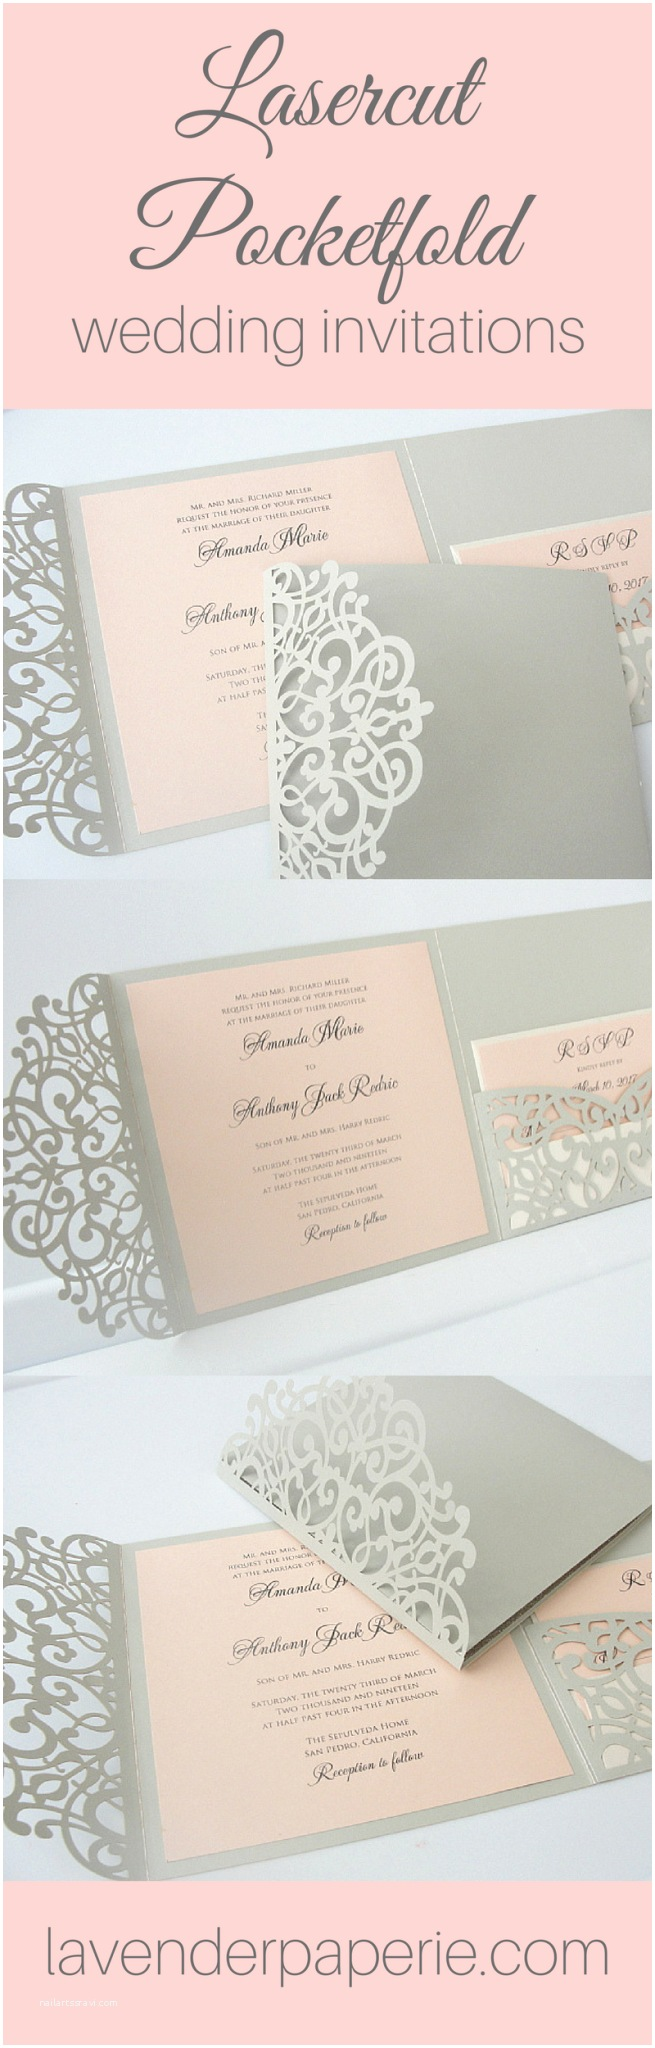 Wedding Invitations for Under $1 Laser Pocketfold Square 3 Light Silver • Lavender Paperie